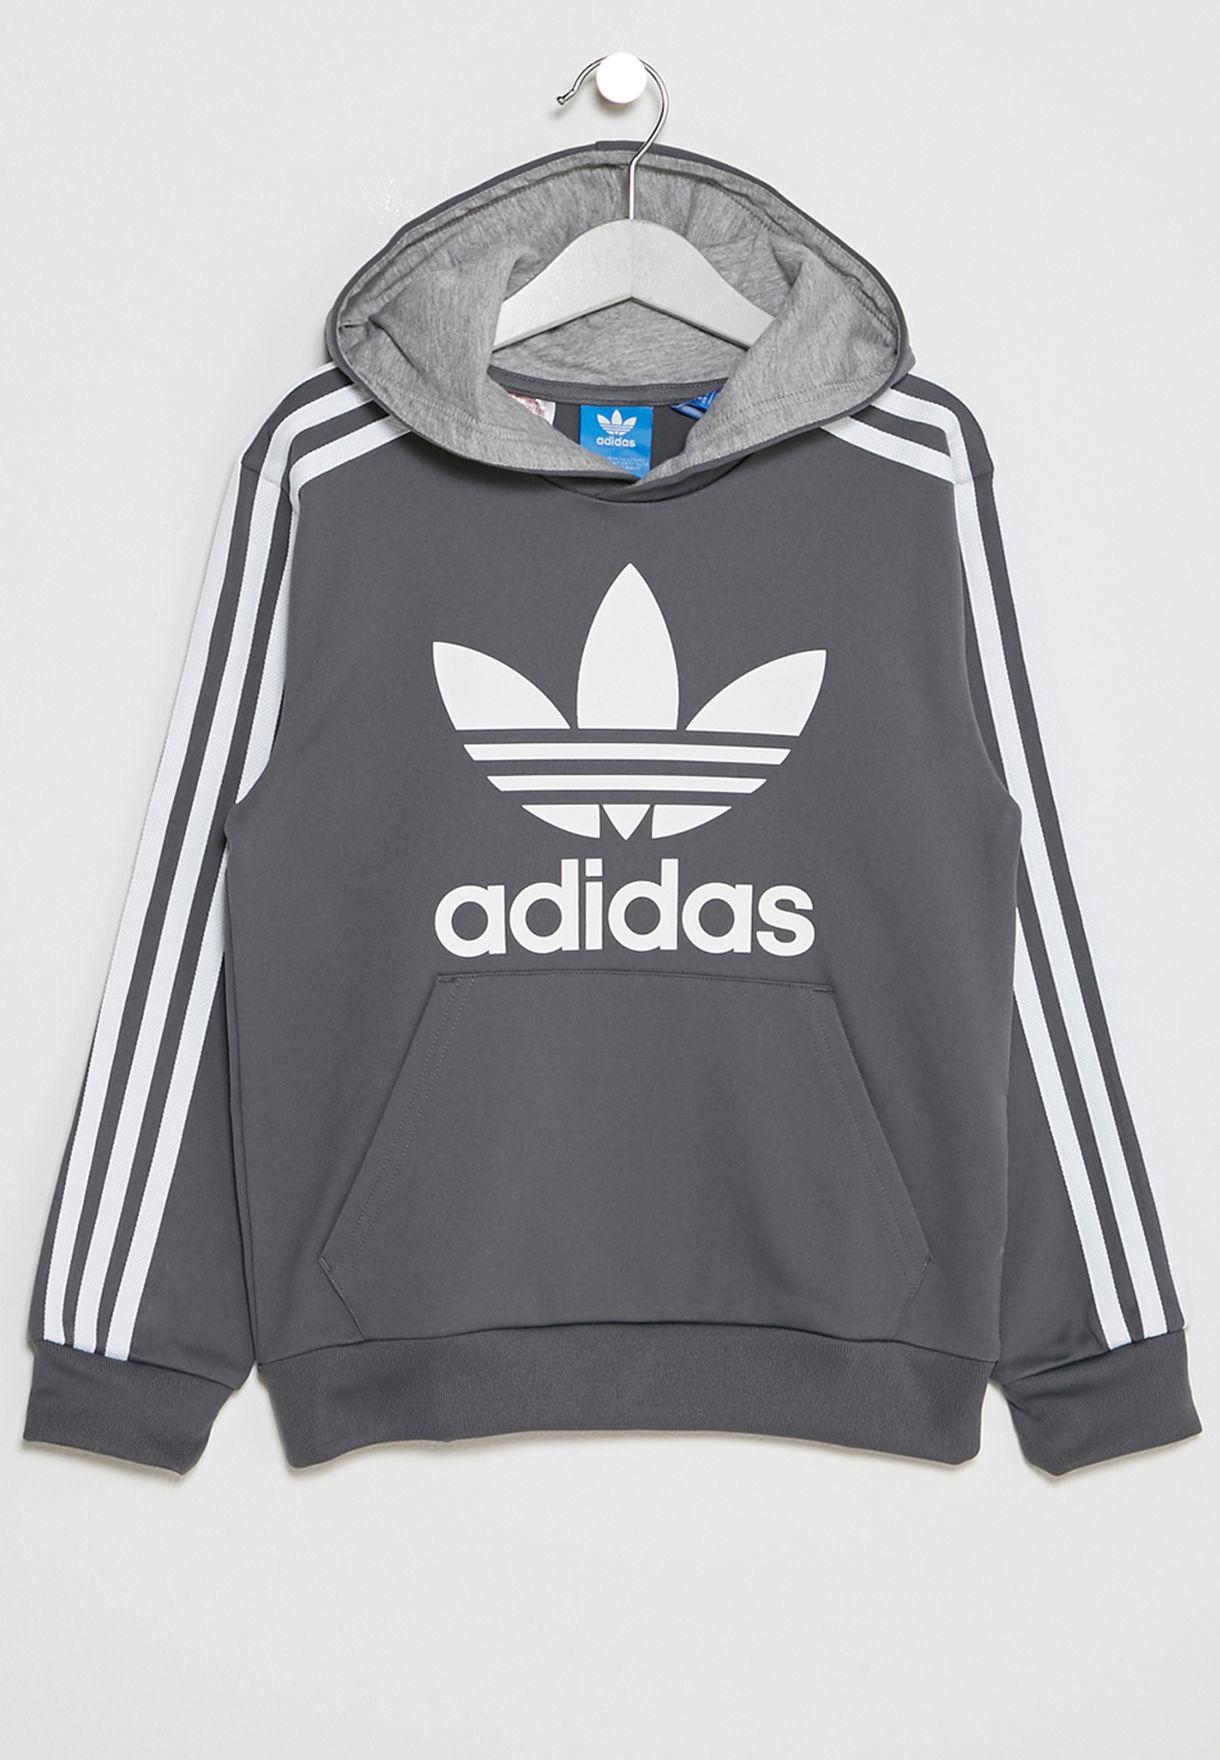 0d73aaee1fb7 Shop adidas Originals grey Youth Trefoil Hoodie BQ3927 for Kids in ...